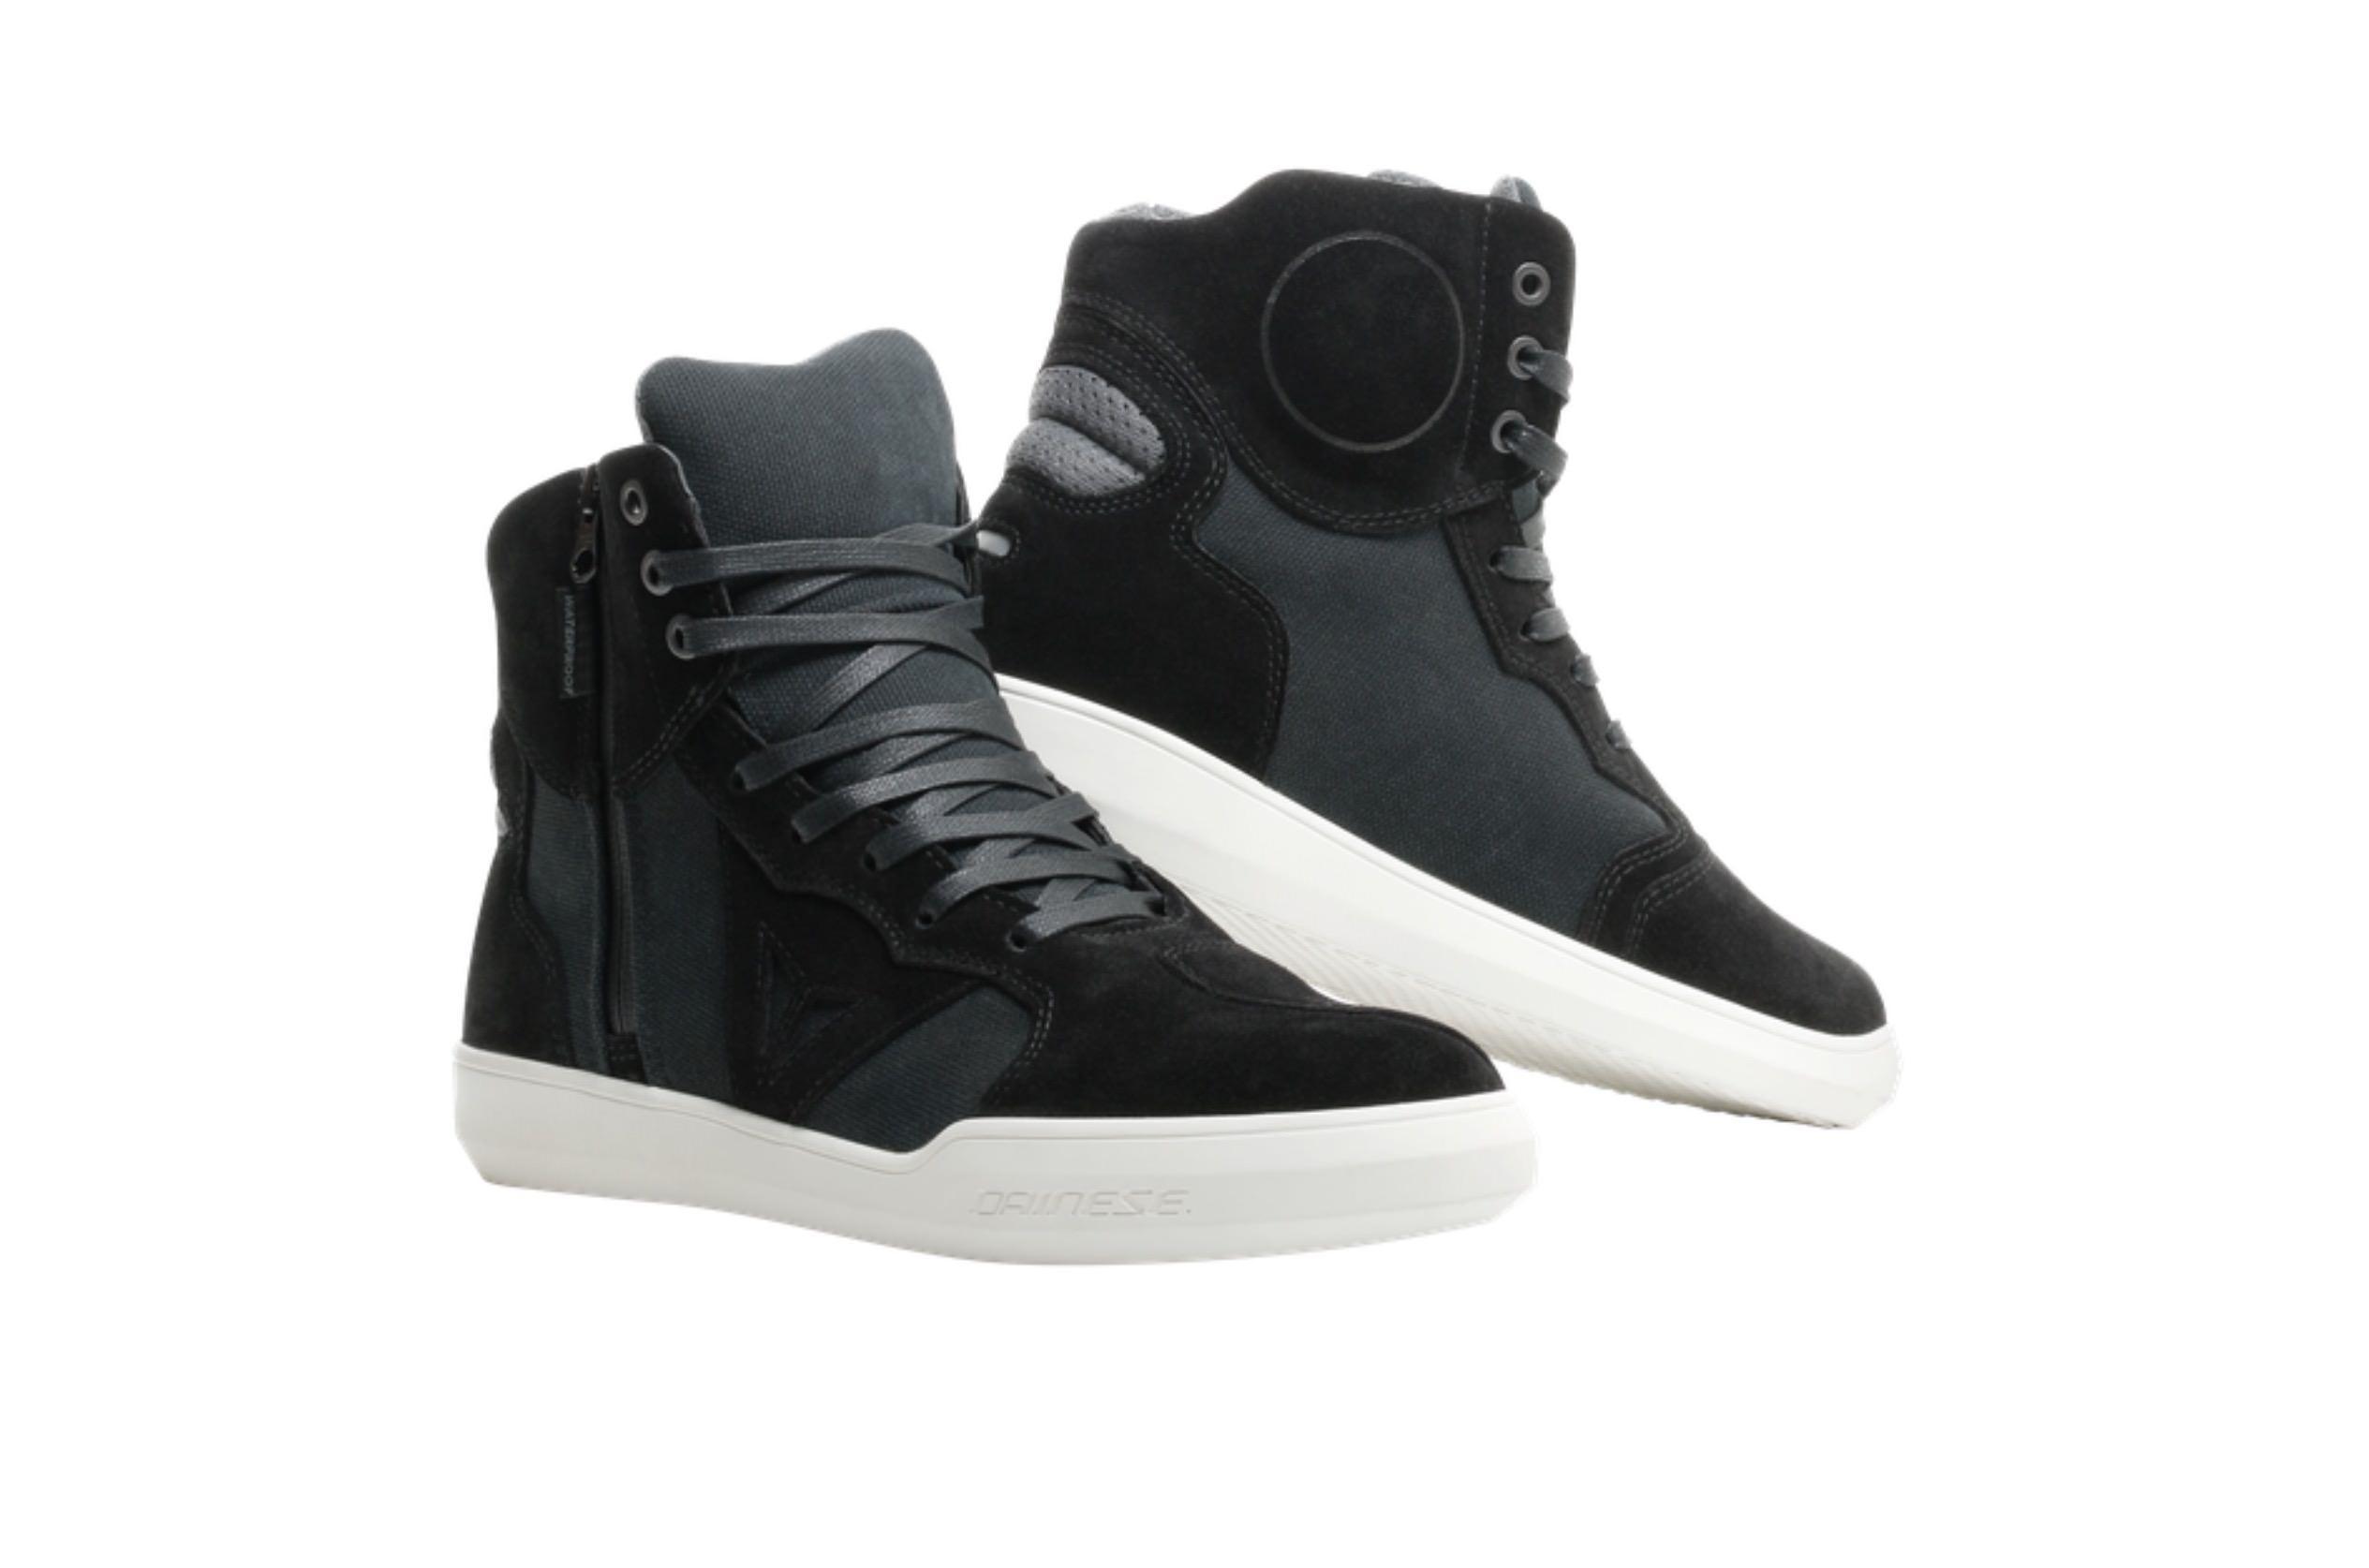 Dainese Metropolis D-WP Motorcycle Shoes Black